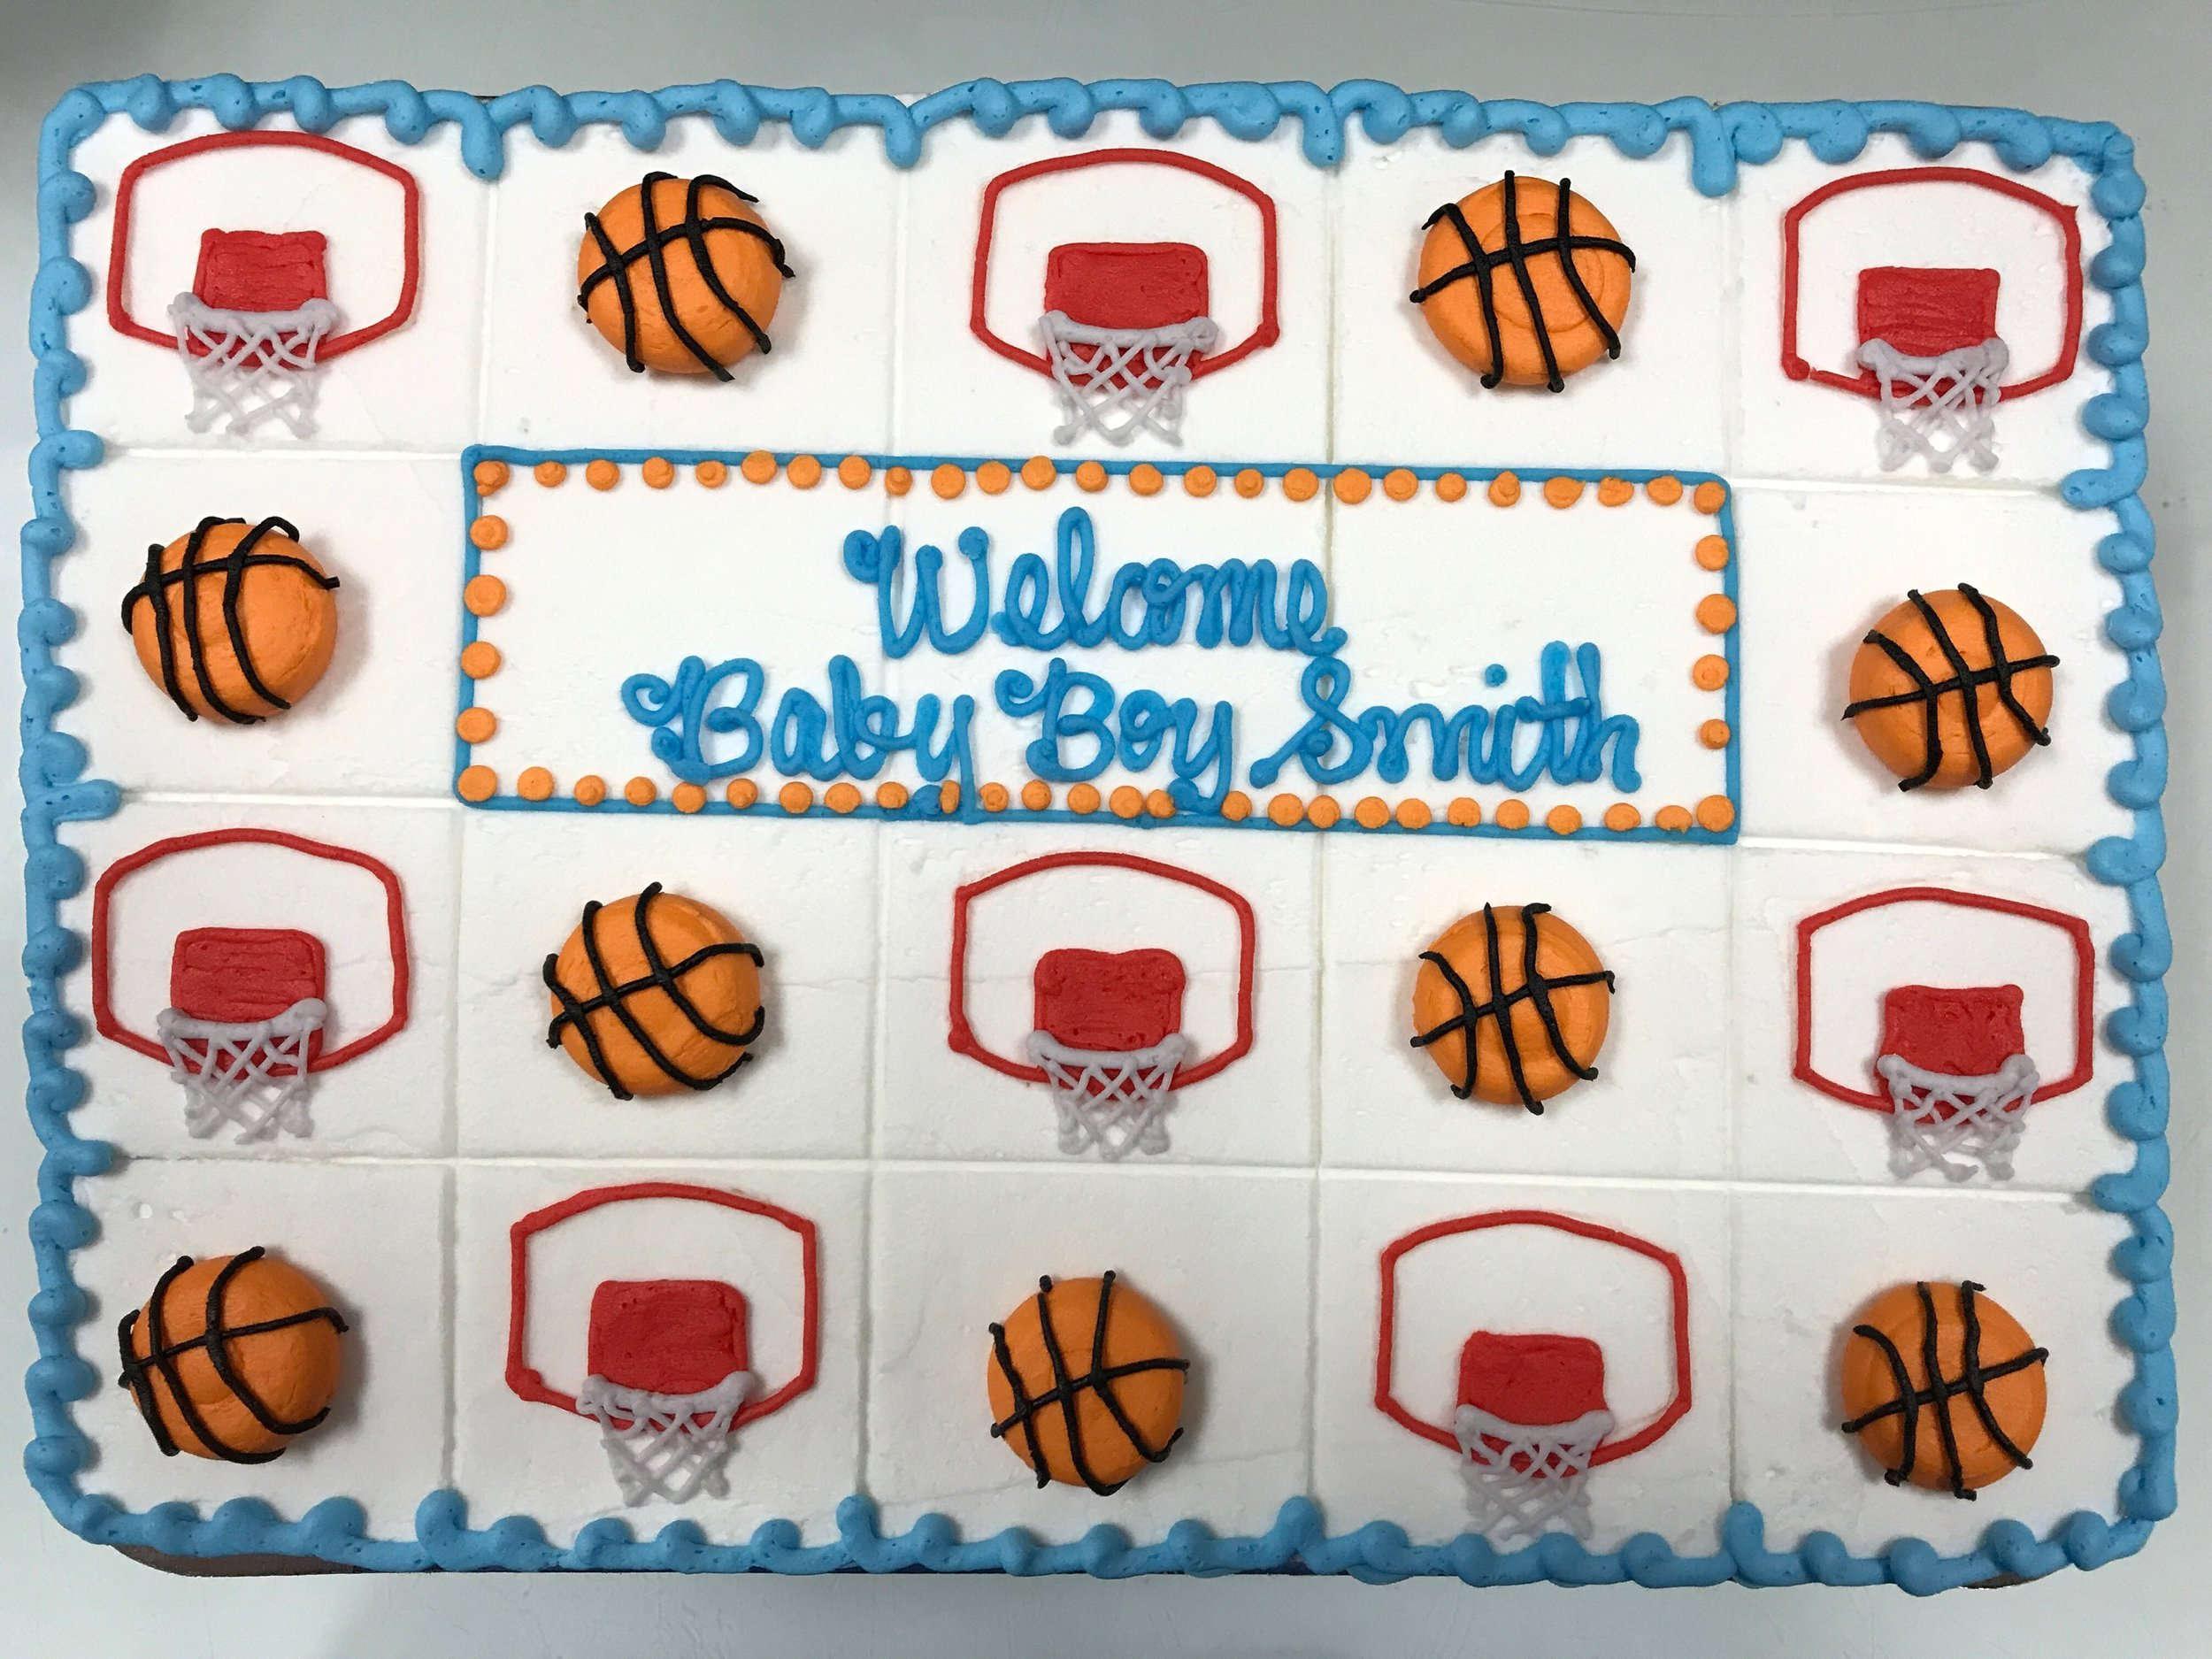 BasketballBaby.jpeg